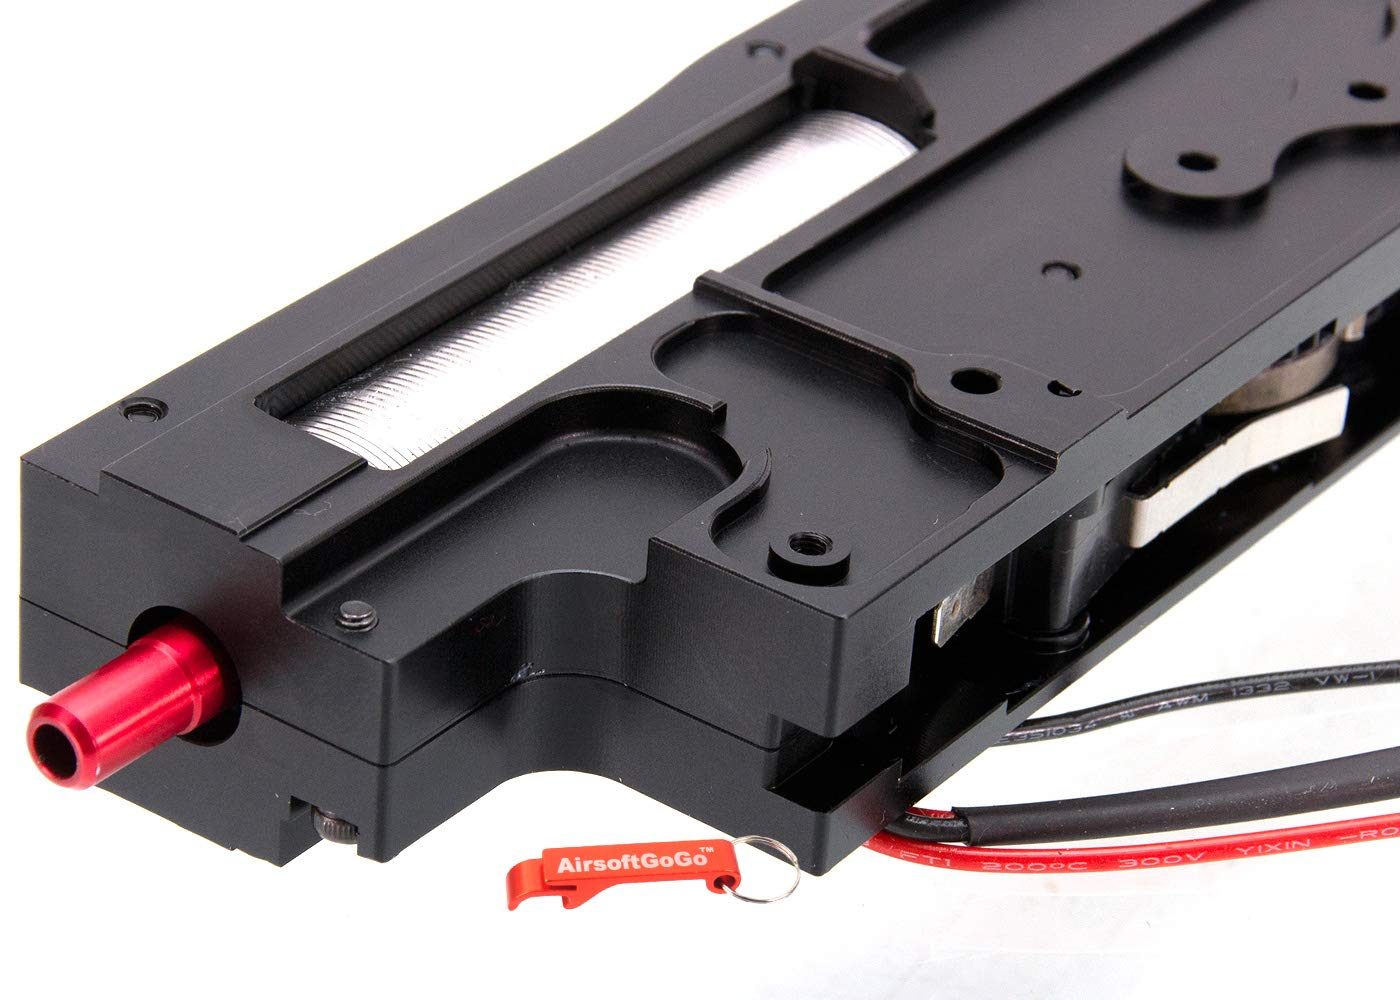 Schwarz Gearbox Komplett aus CNC Aluminium f/ür A/&K//Classic Army M249 Serie Softair AEG